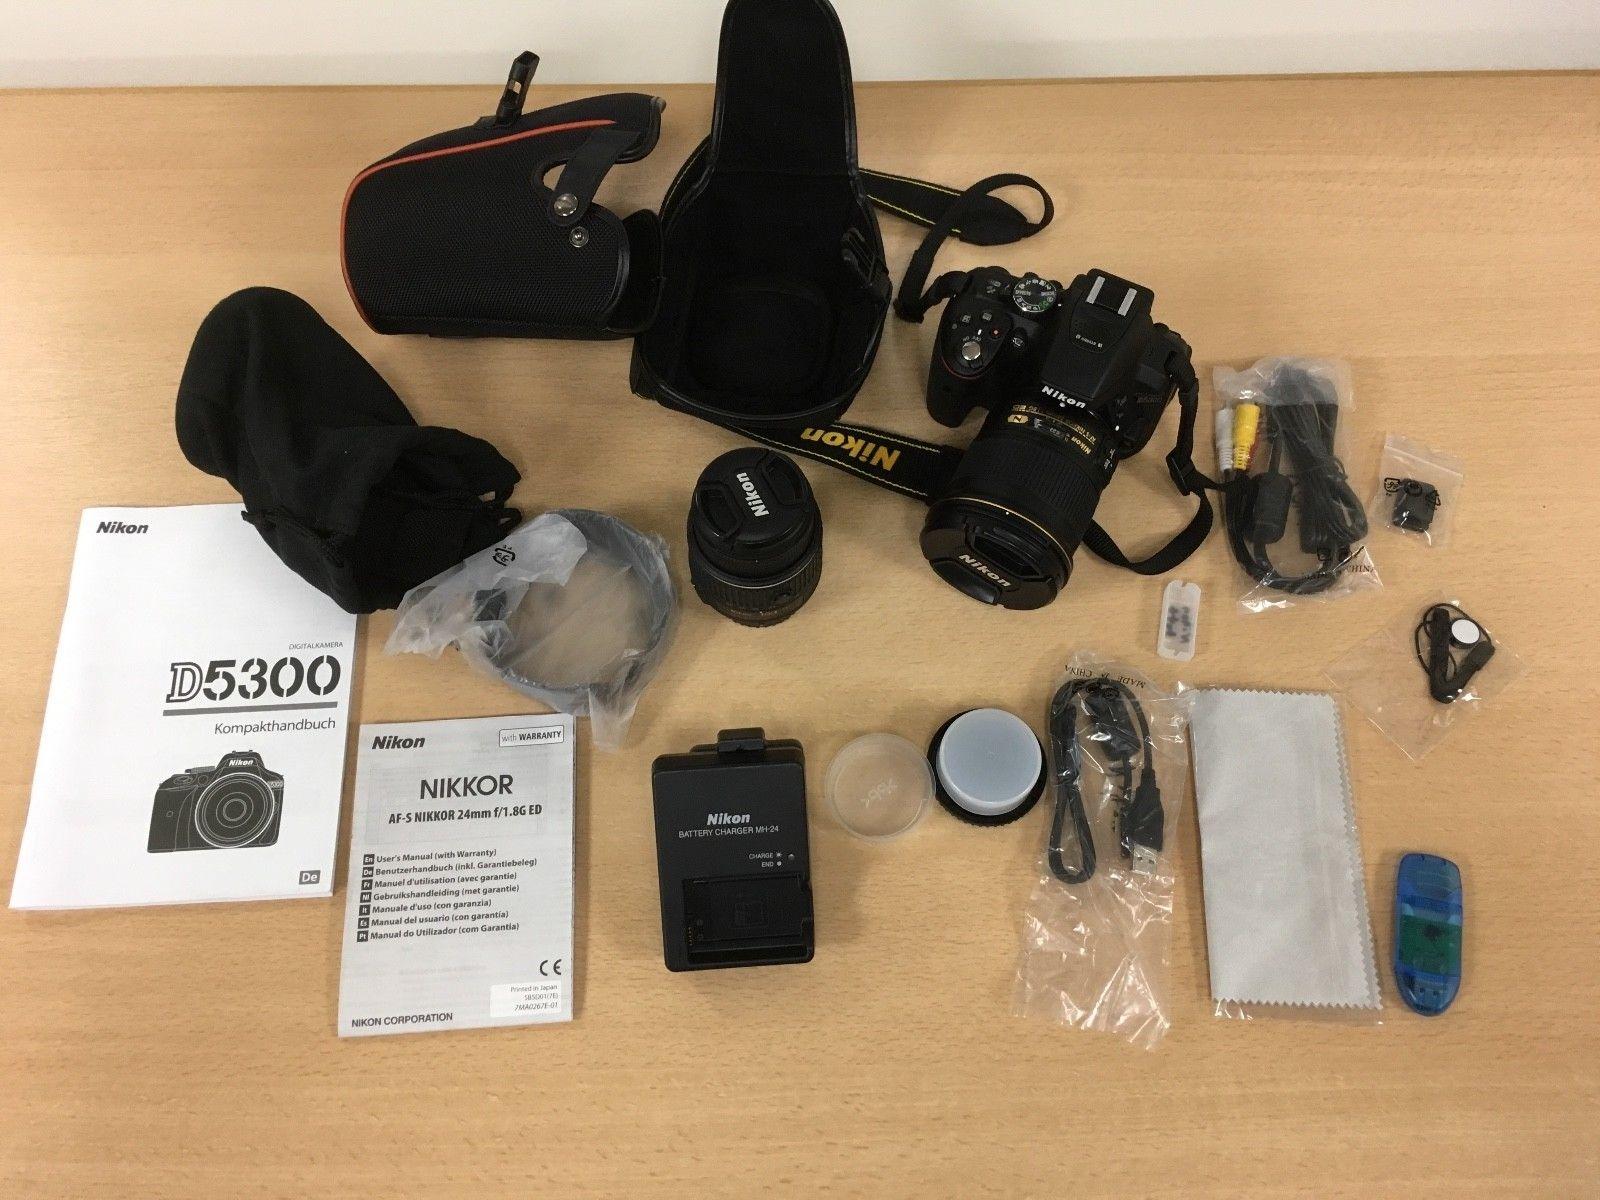 Nikon D5300 Kit AF-P DX VR 18-55 + AF-S NIKKOR 24mm 1:1.8G ED